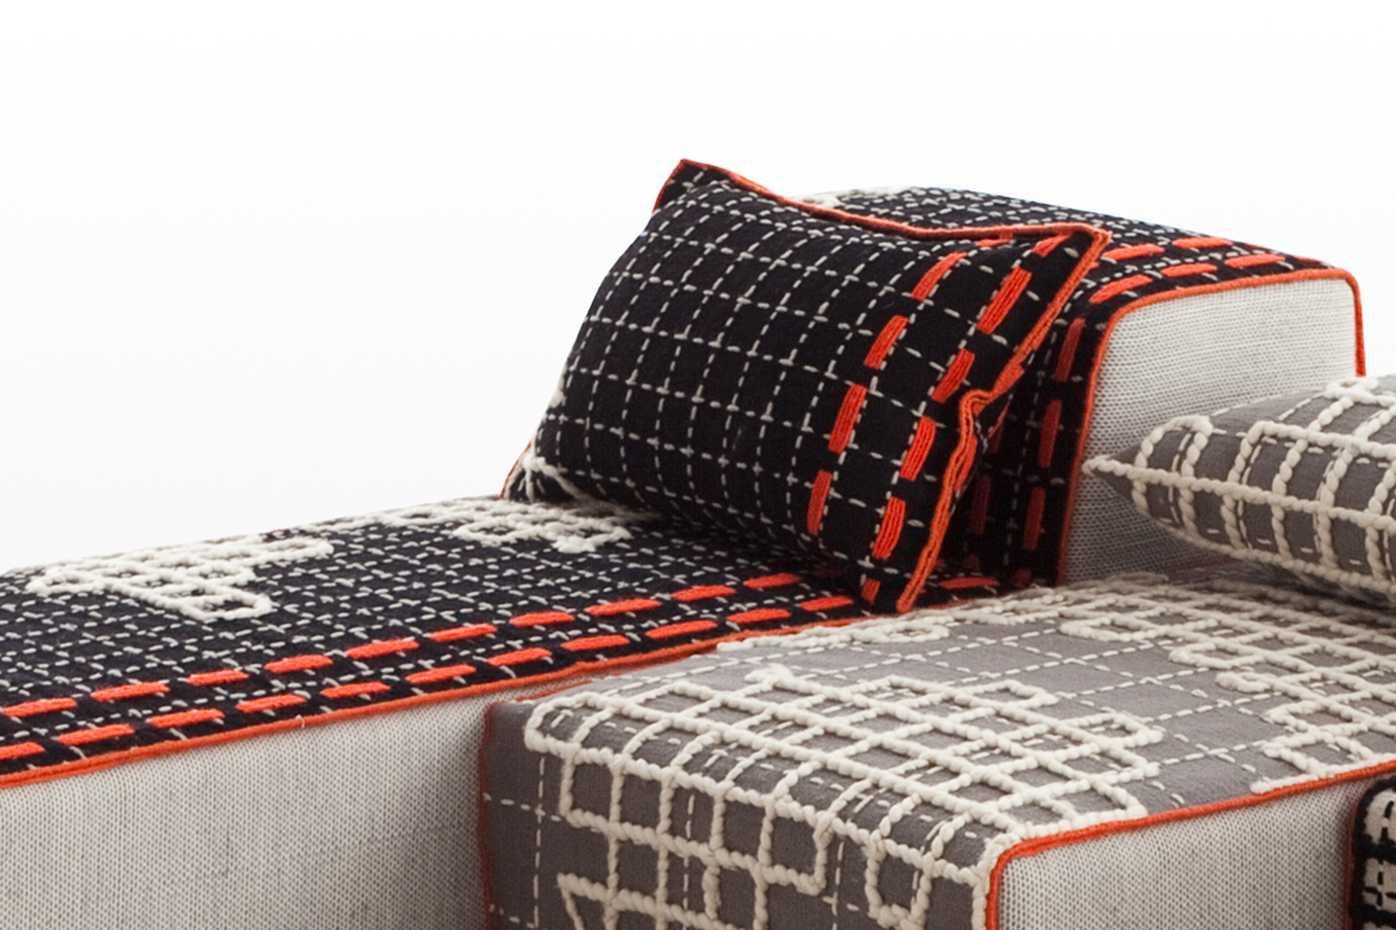 Bandas Cushions by Gan Rugs product image 2